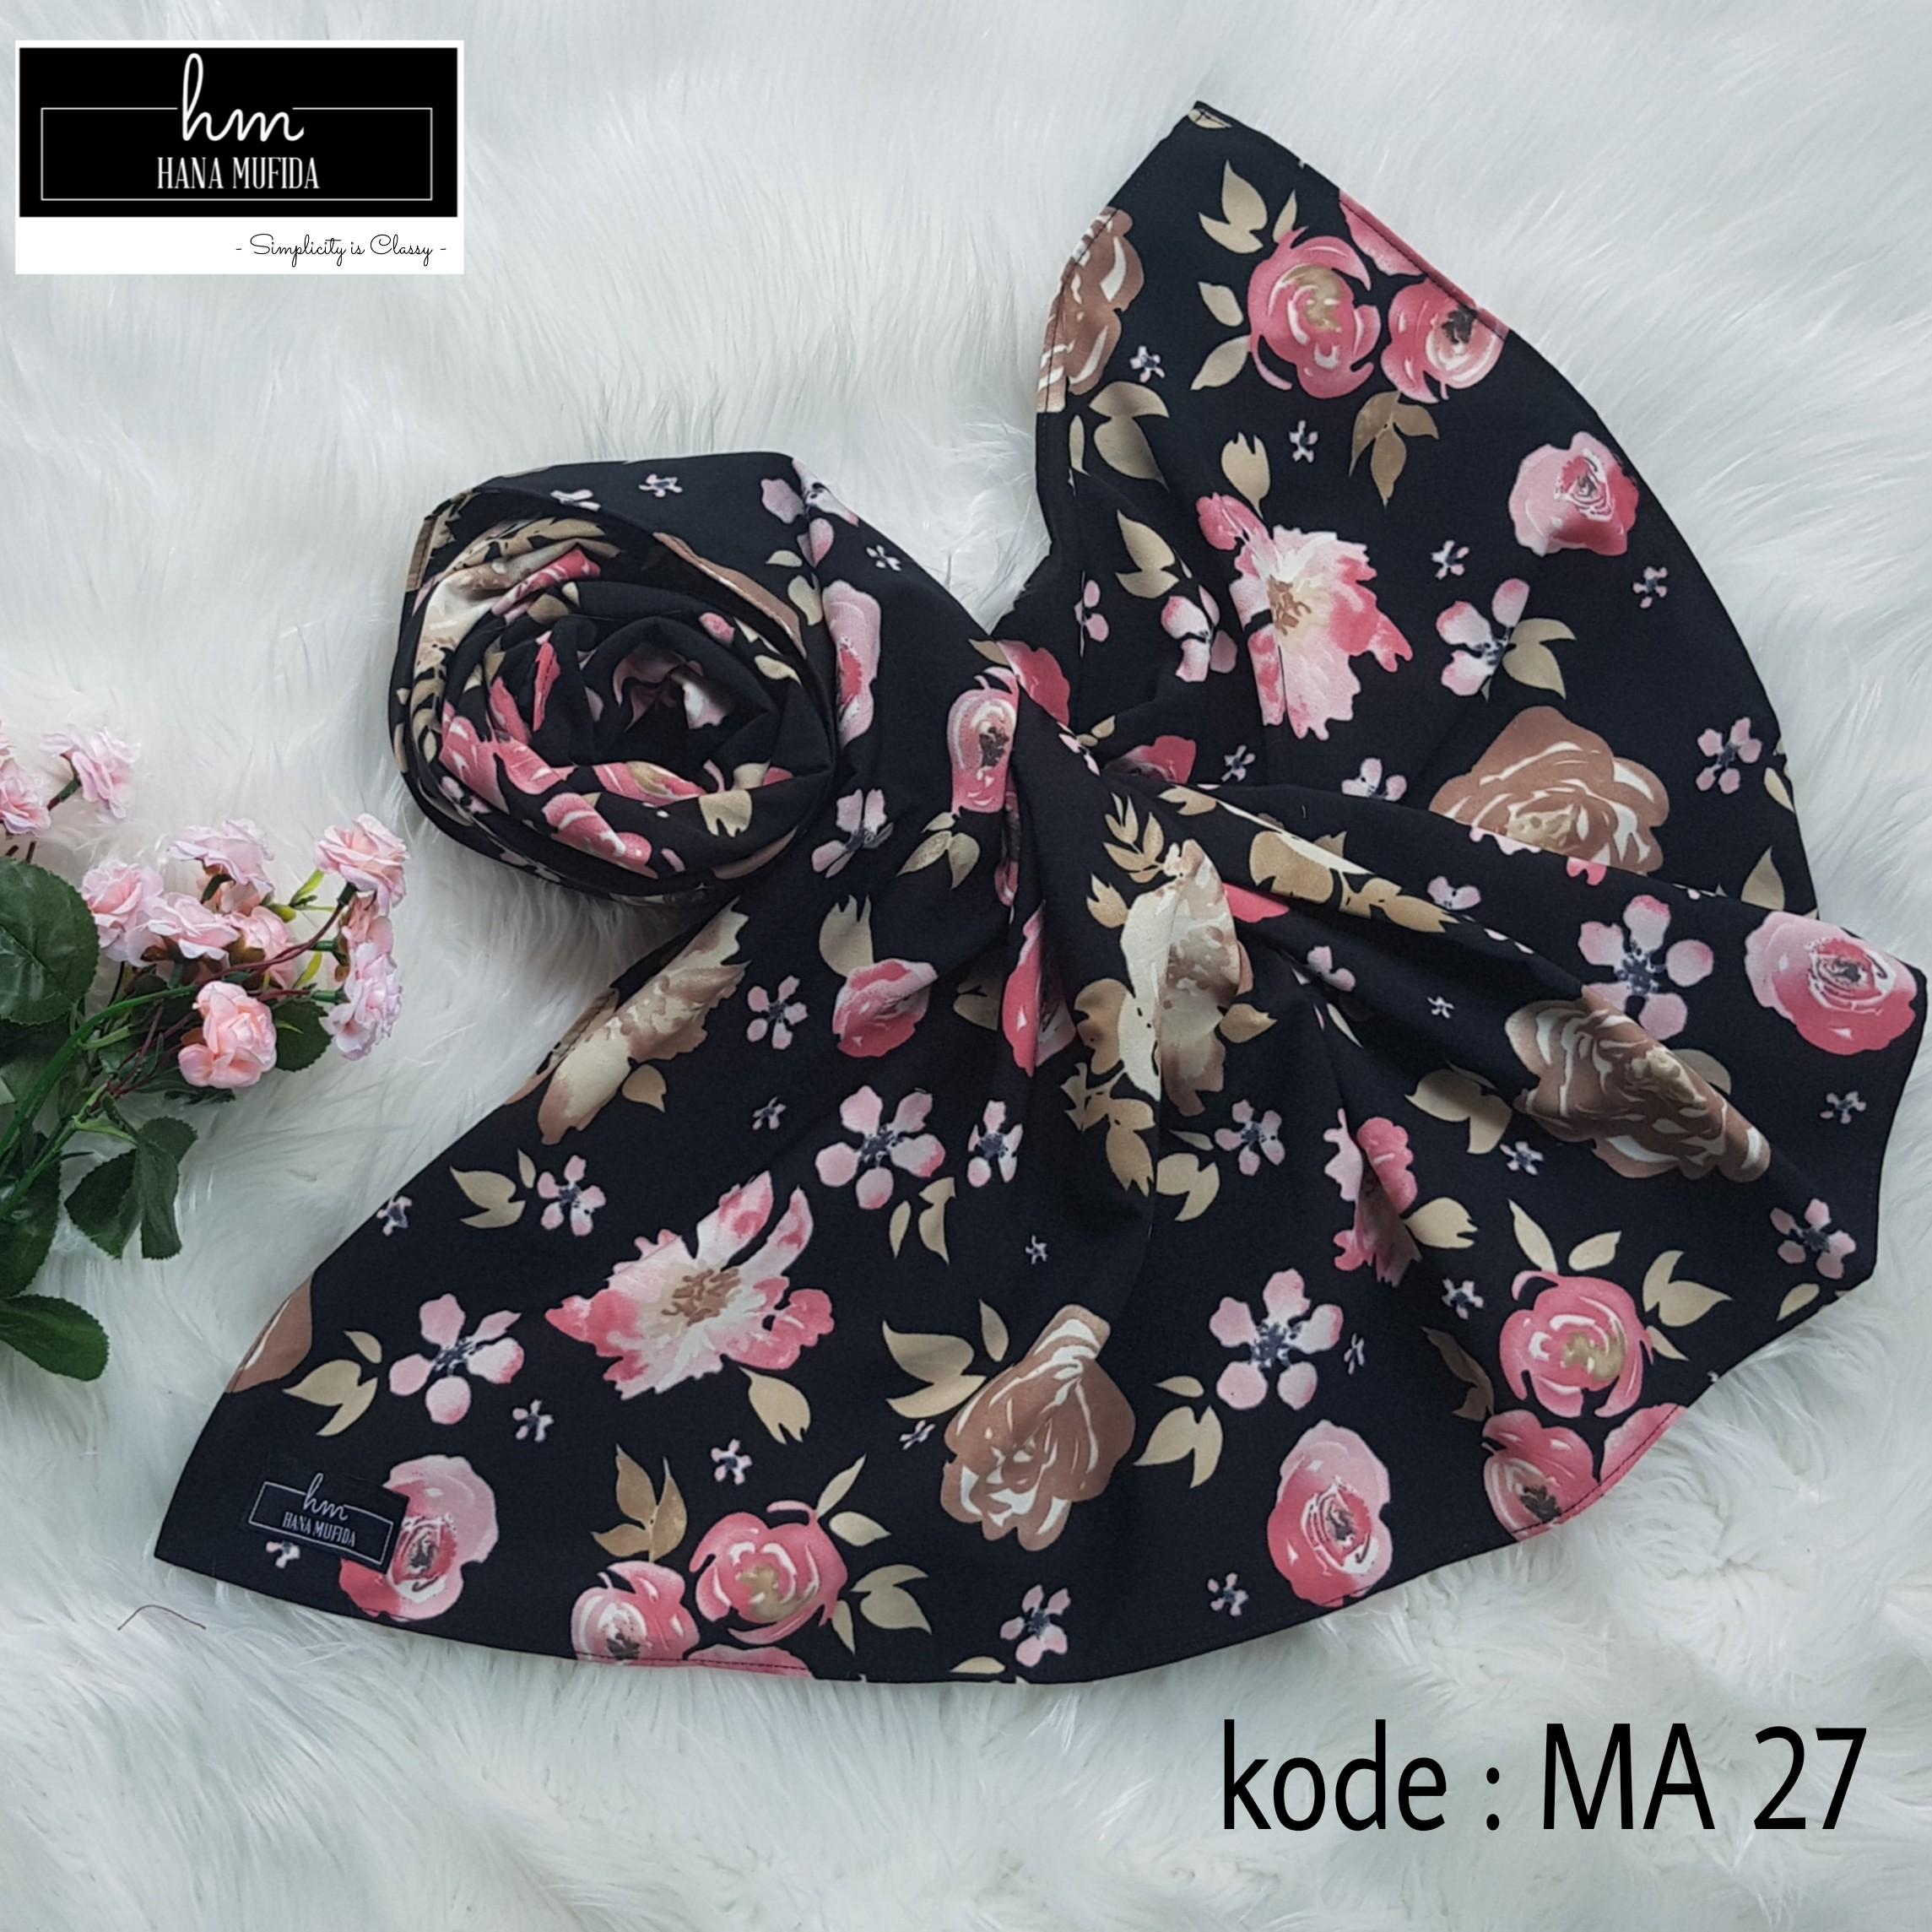 Hijab square motif 120cm kode MA 27